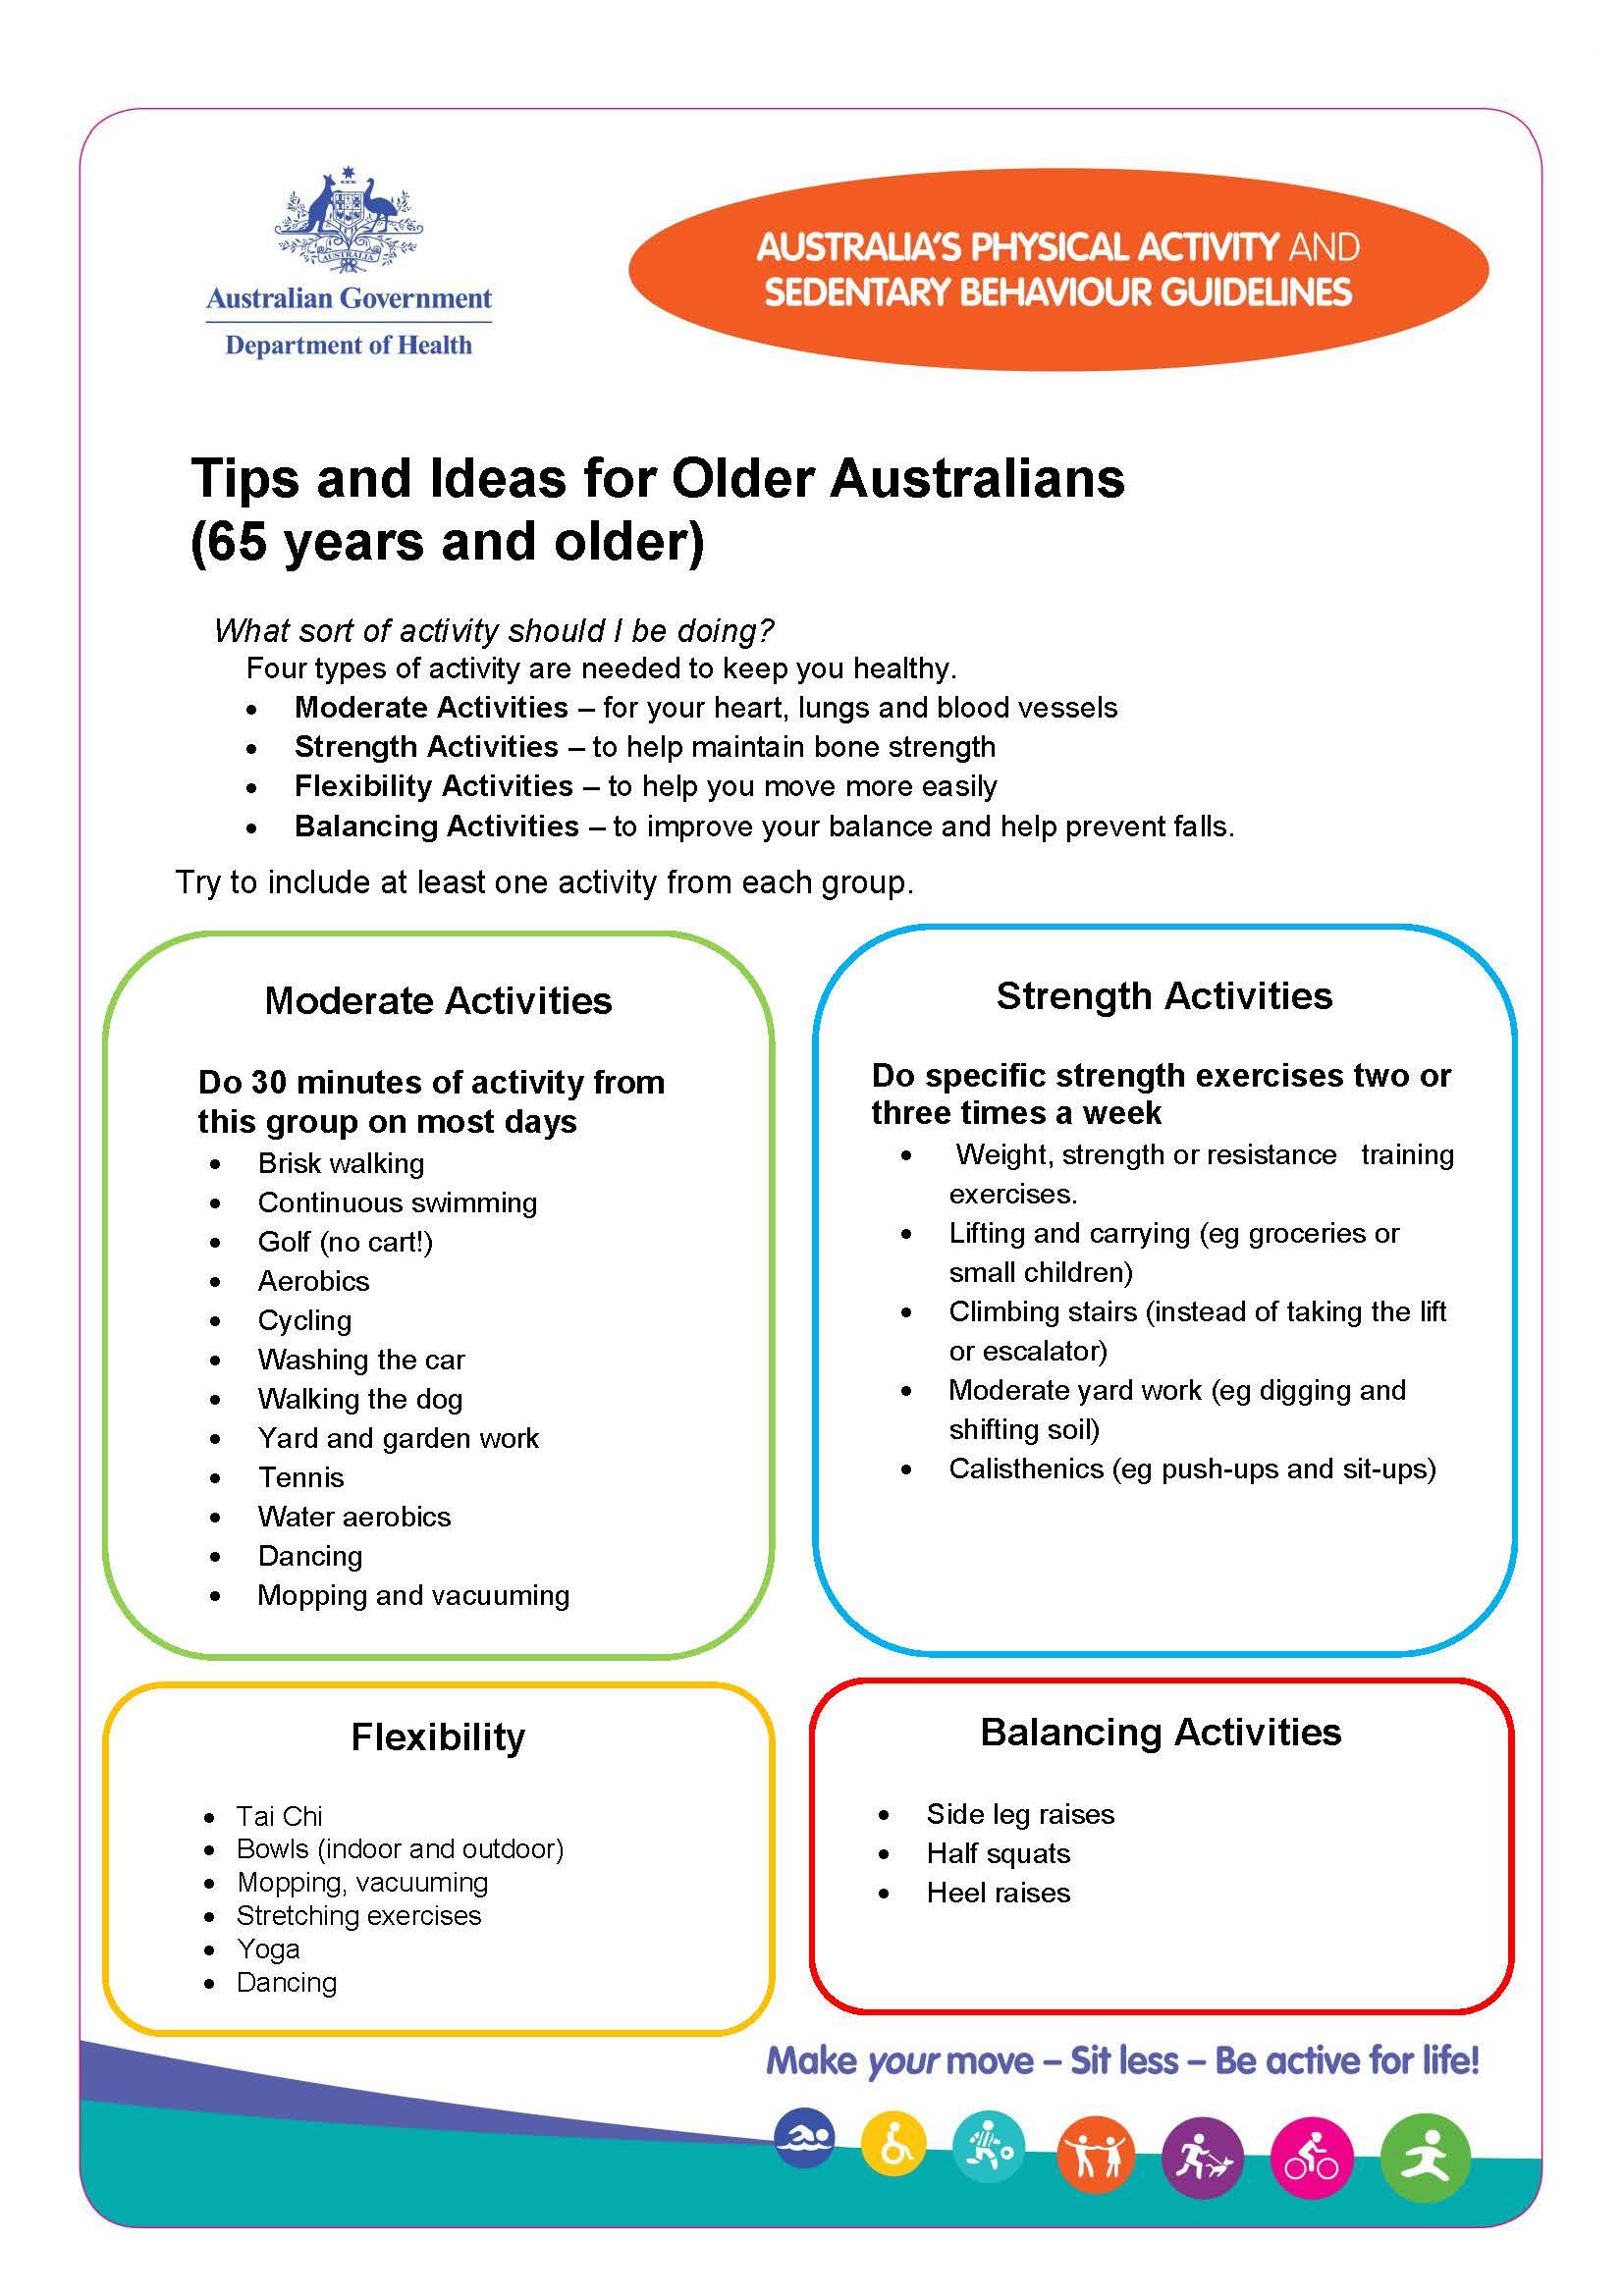 Tips&Ideas-Older-Aust-65plus_Page_1.jpg